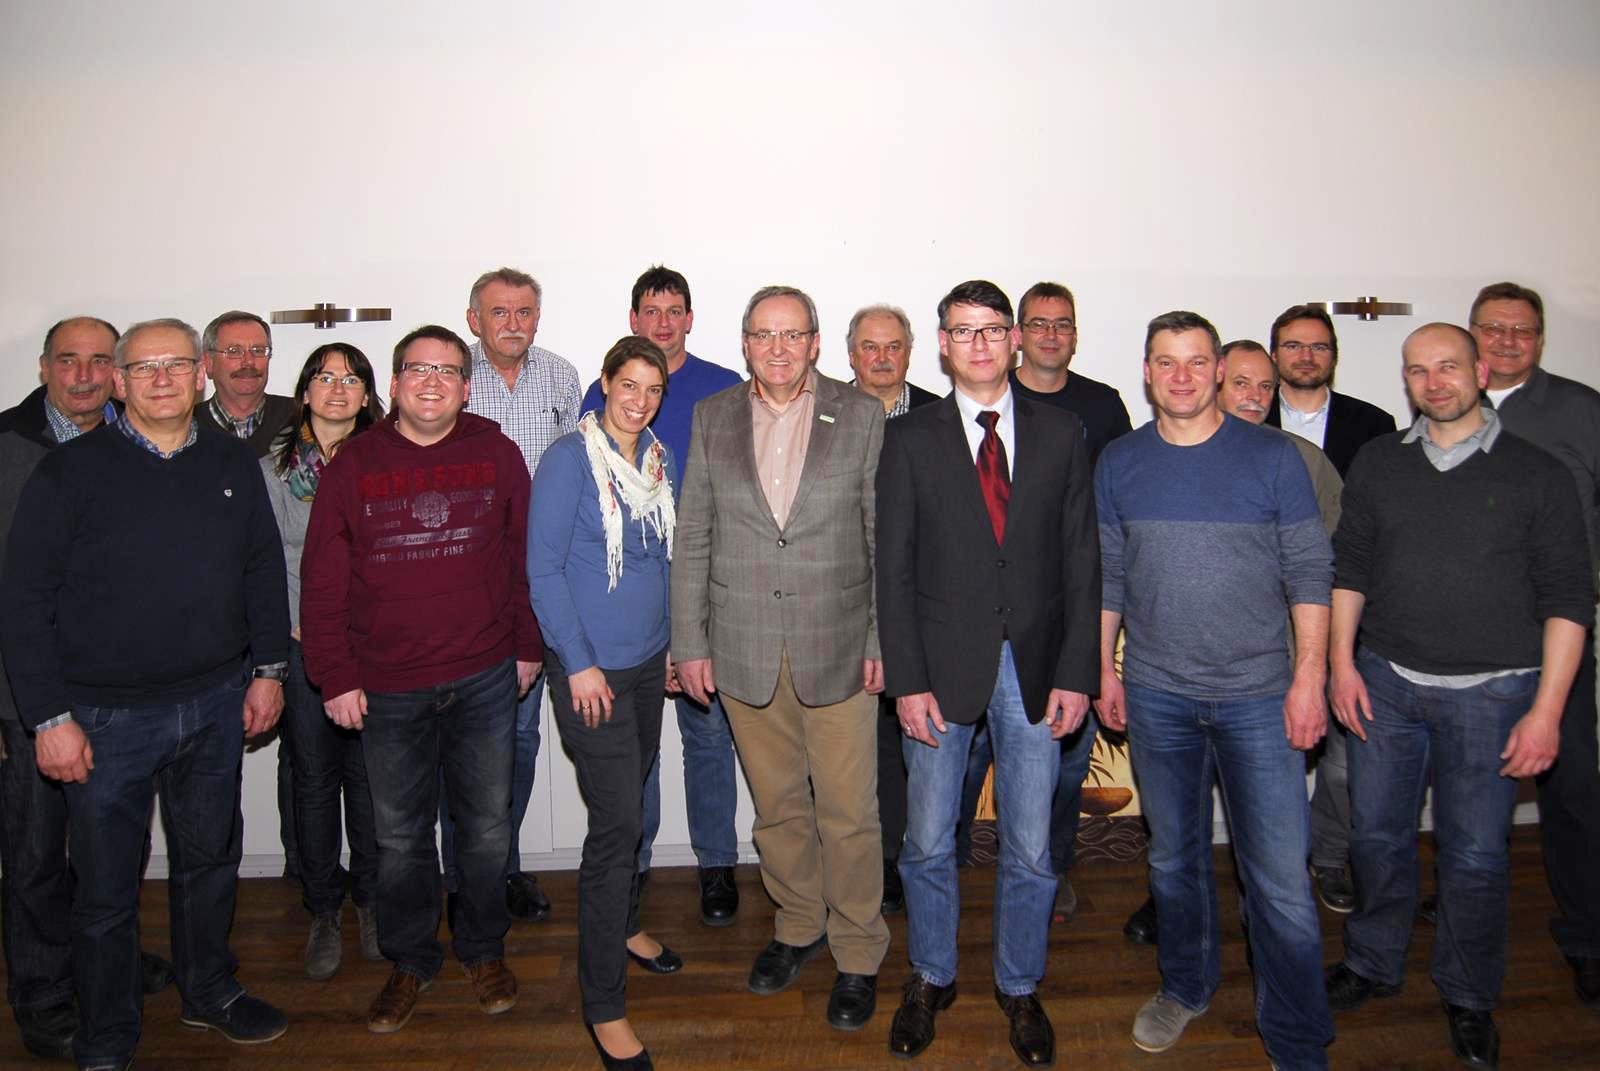 CDU Emmelshausen nominiert Frank Fischer als Bürgermeisterkandidaten